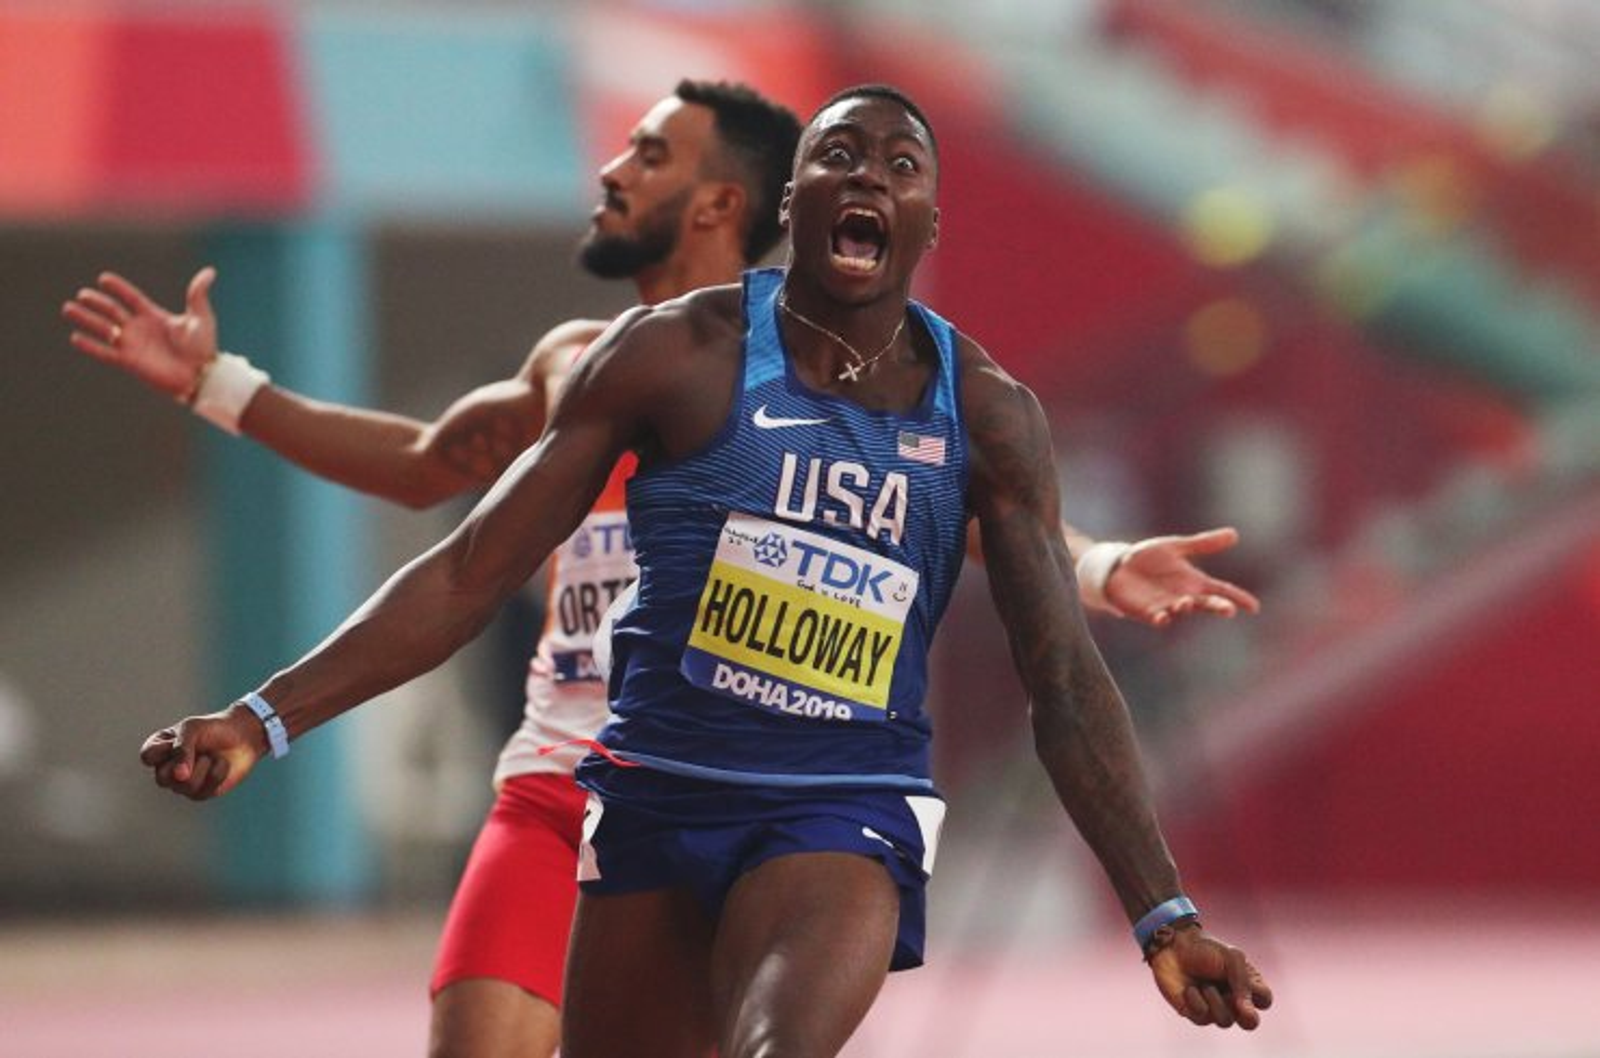 Athletics - World Athletics Championships - Doha 2019 - Men's 110 Metres Hurdles Final - Khalifa International Stadium, Doha, Qatar - October 2, 2019  Grant Holloway of the U.S. reacts after winning gold REUTERS